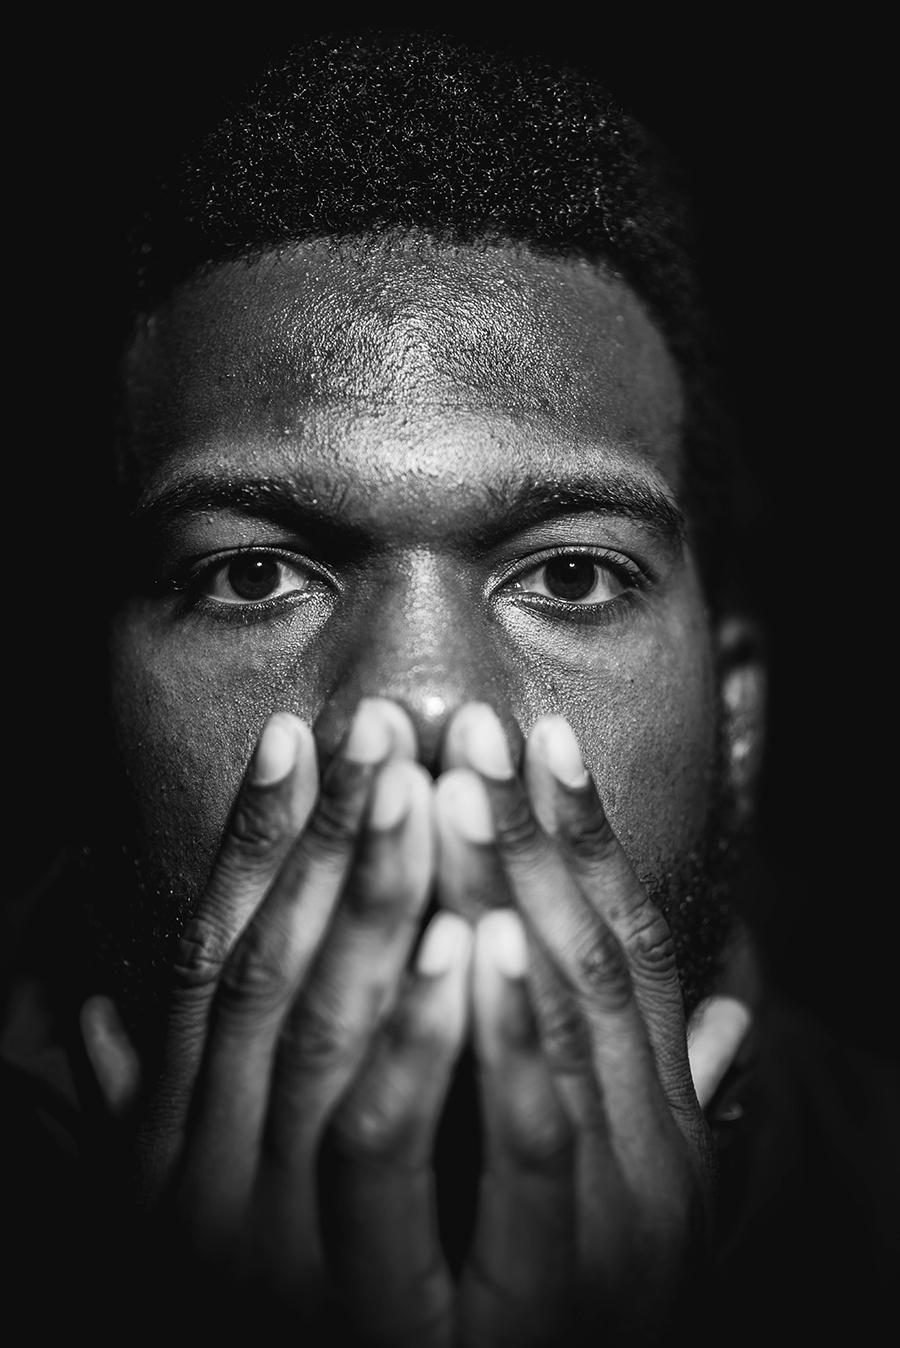 Tyrone_Love_photography_model_photo_emotion_portrait_headshot_kaleb_germinaro